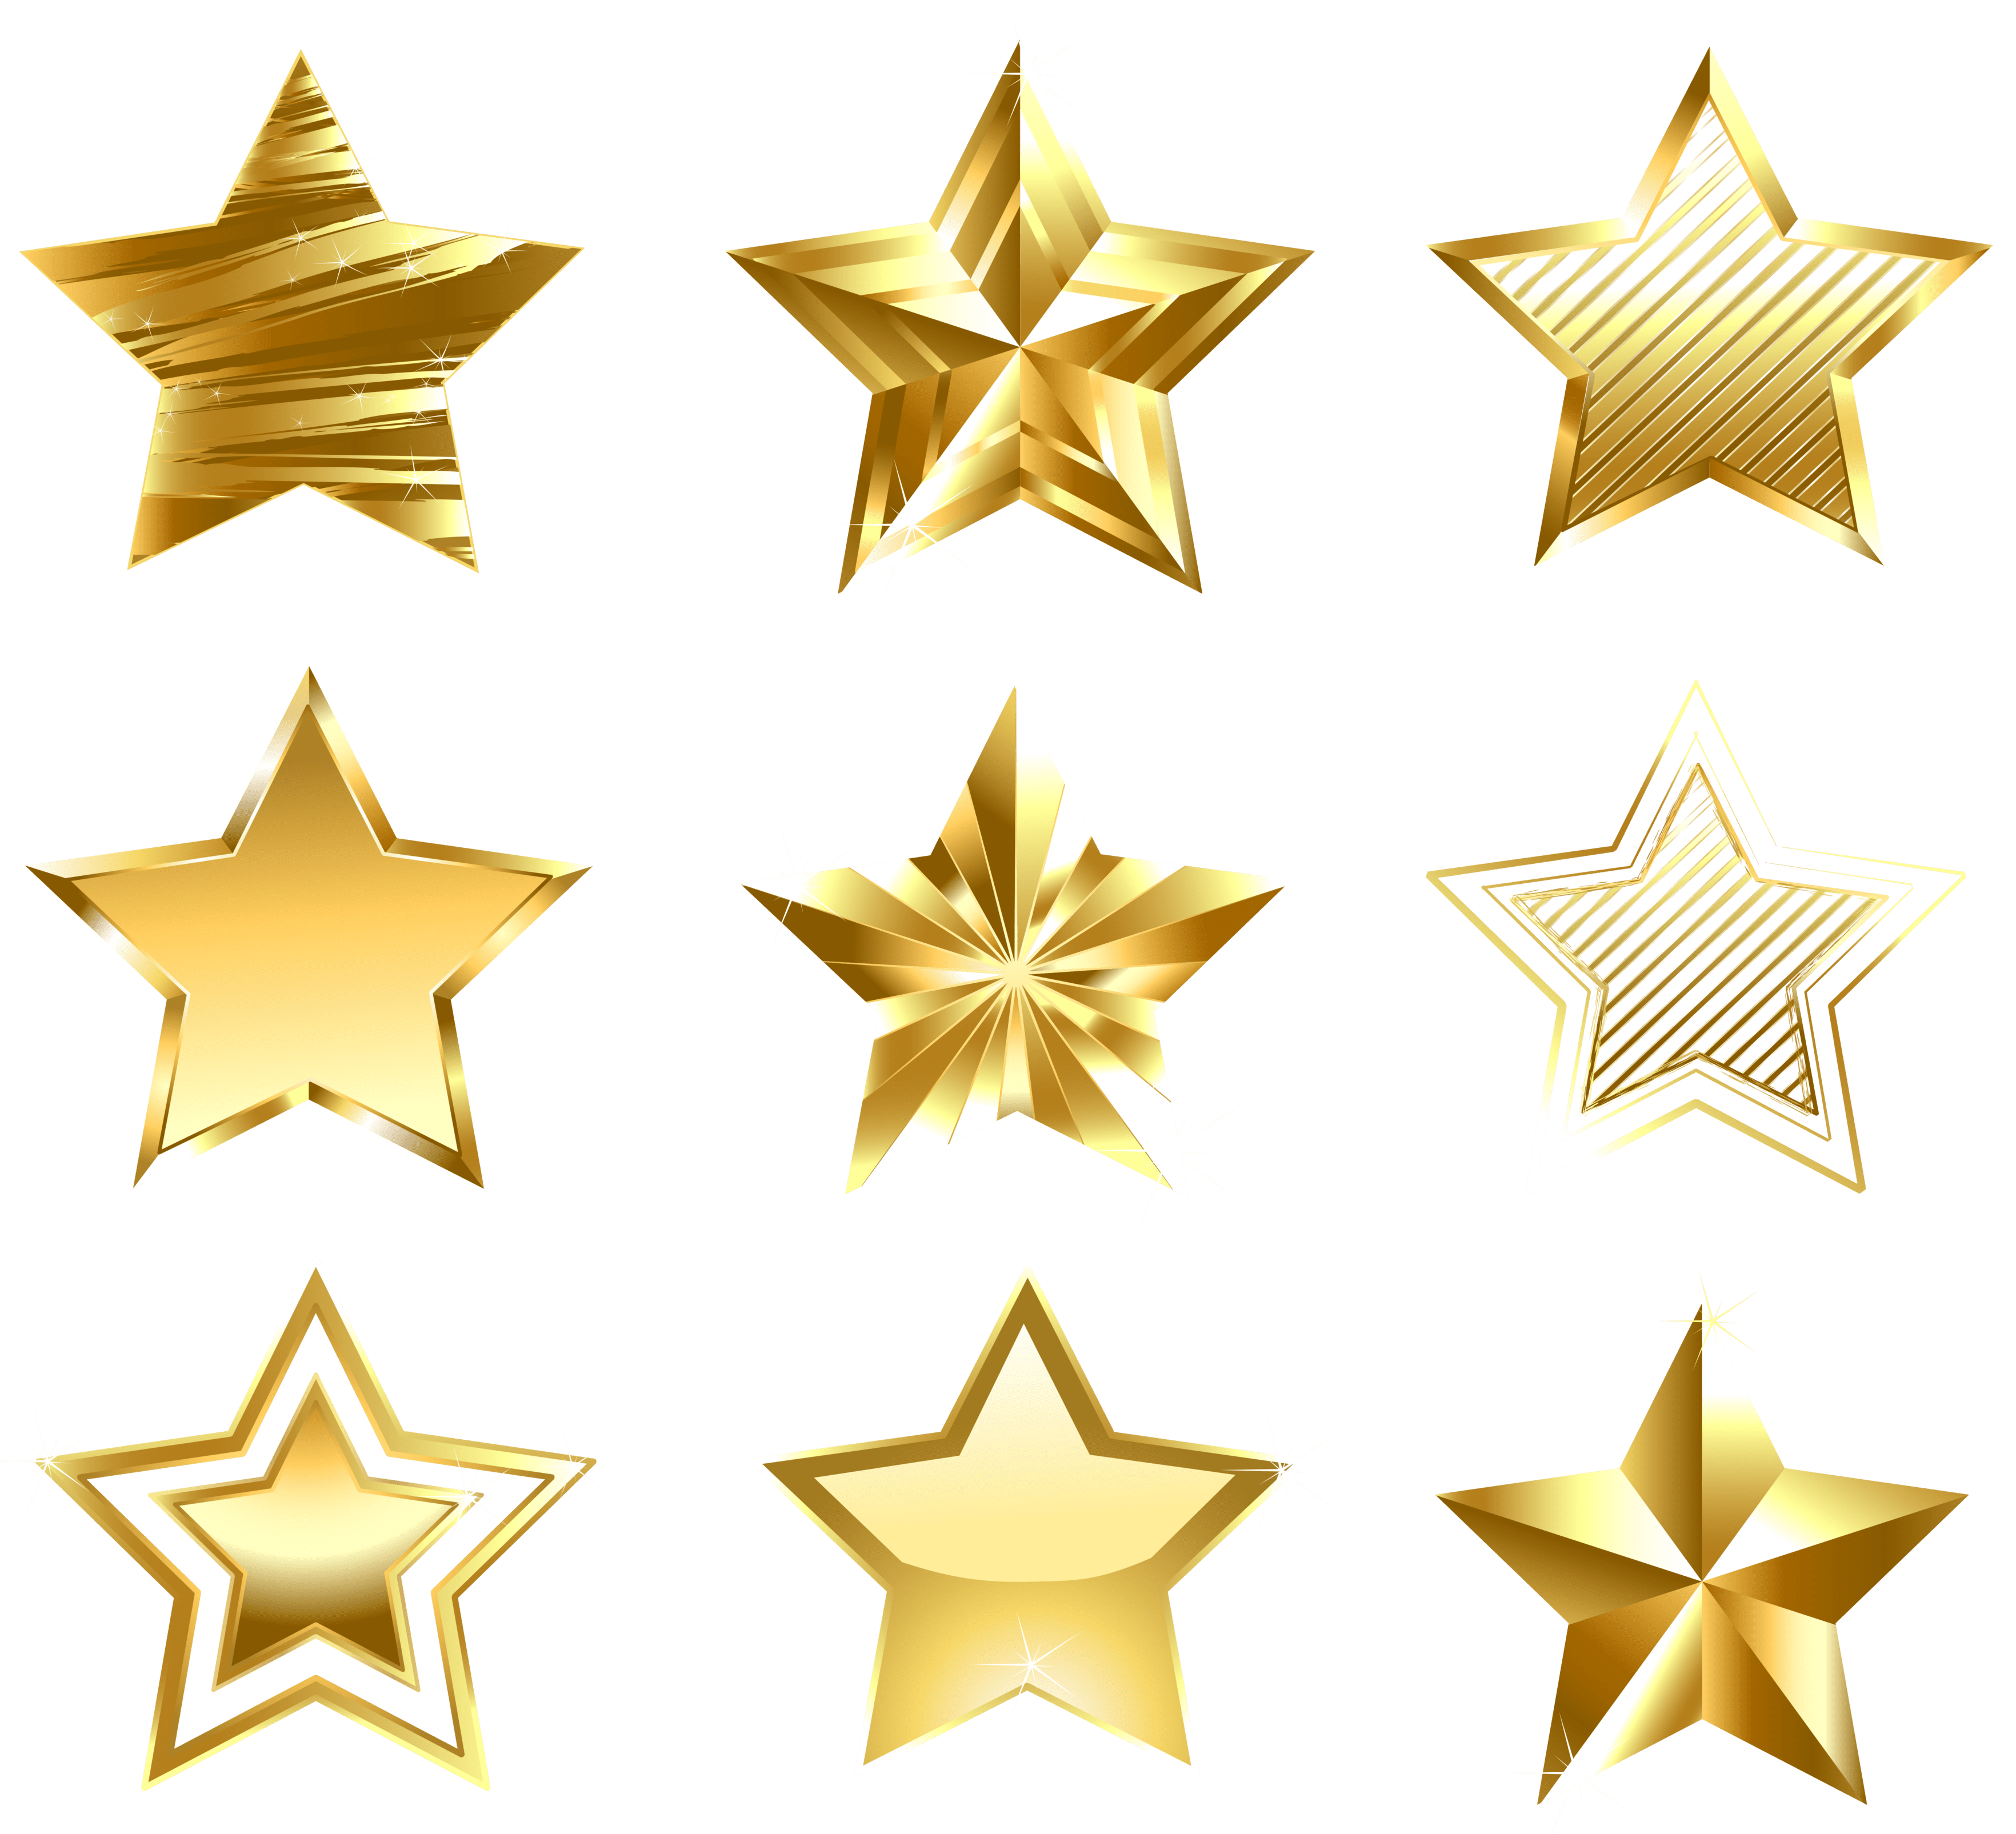 Transparent Golden Stars Set PNG Clipart